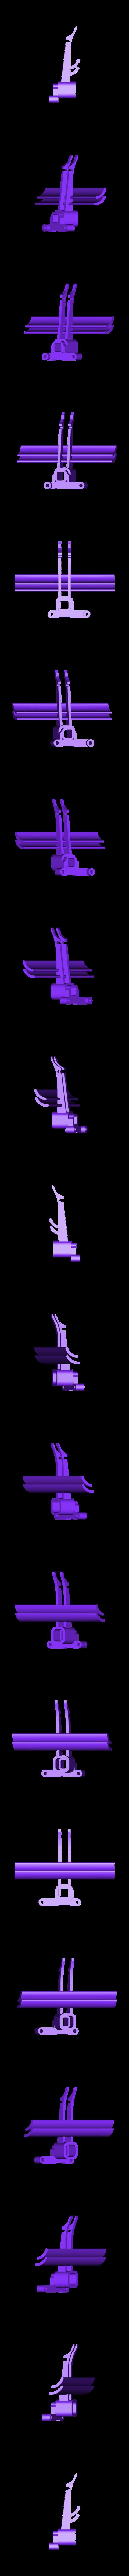 rear wing black.stl Download free STL file Aryton Senna's Mclaren MP4/6 3d Printed RC F1 Car • 3D printing design, brett